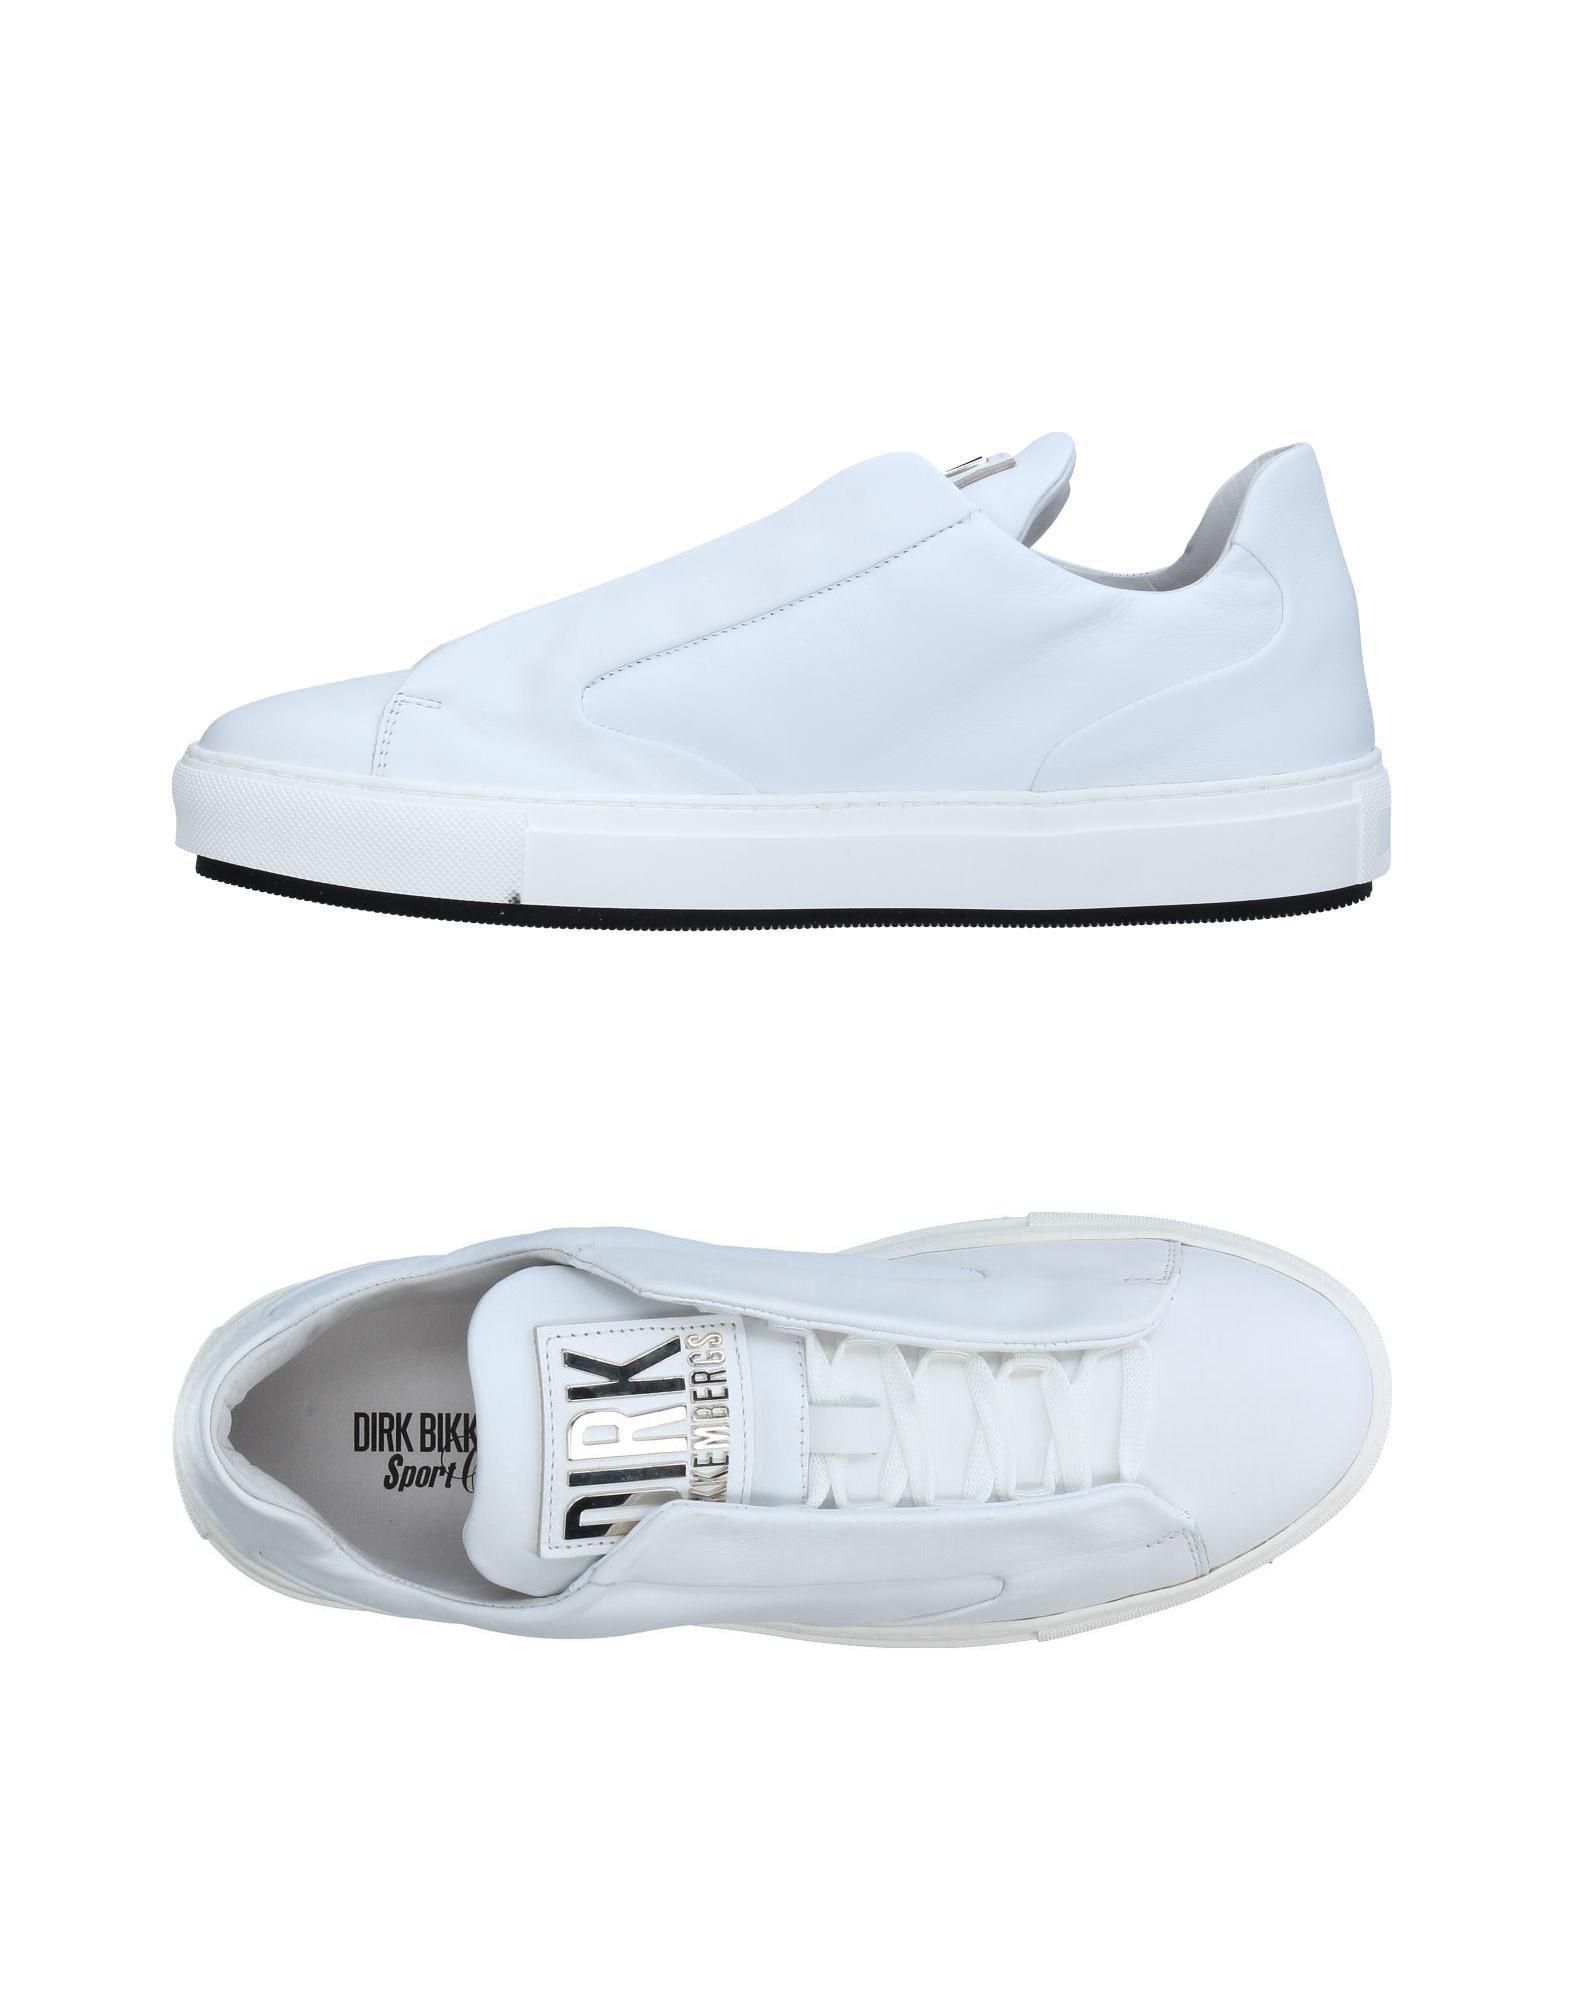 Chaussures - Haute-tops Et Baskets Fiorangelo 6EpHj92z3